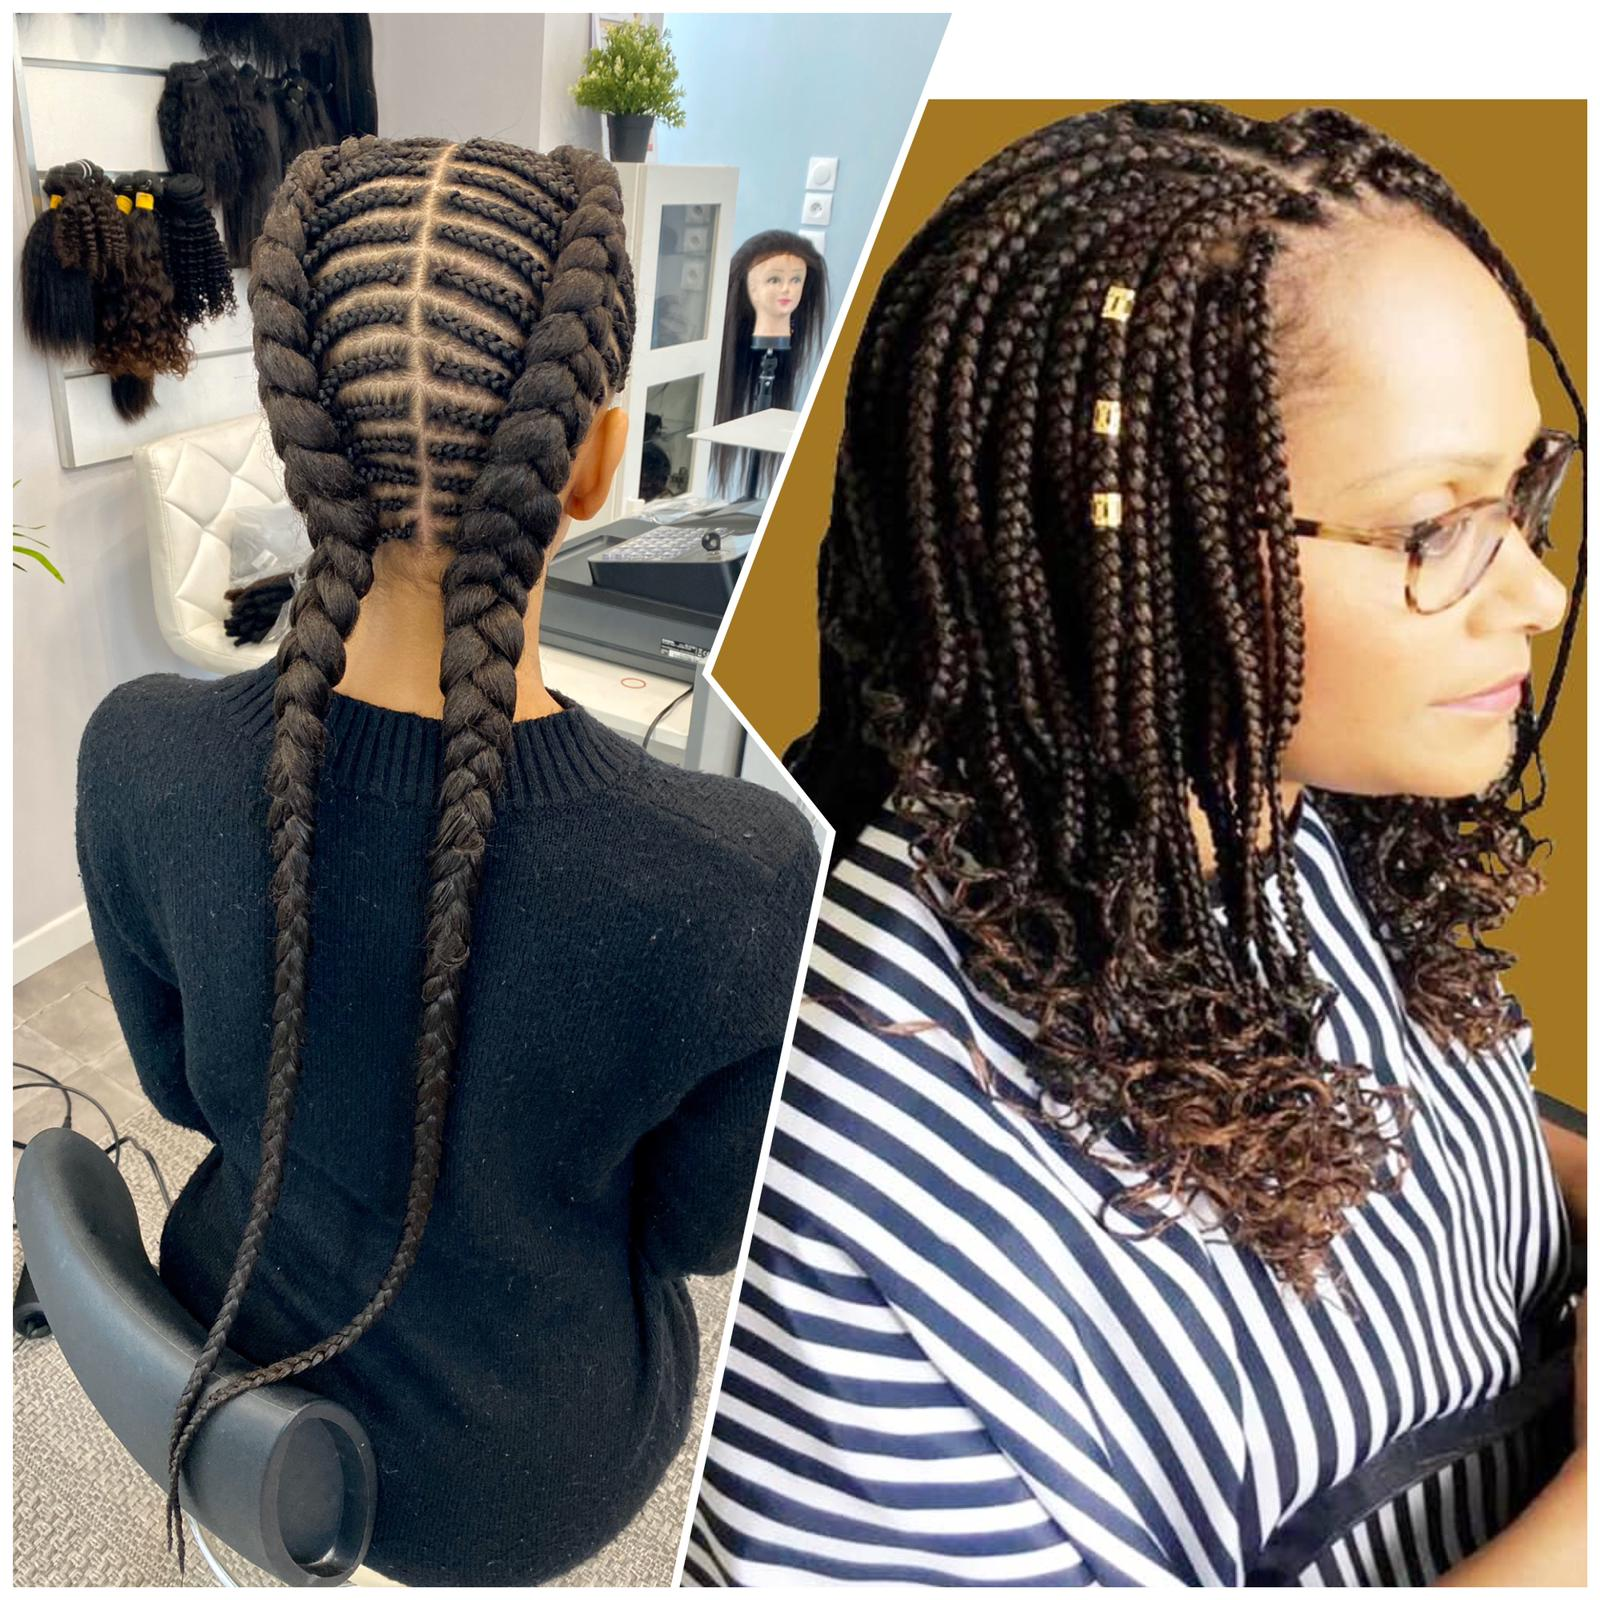 salon de coiffure afro à lille - dreadlockscenter